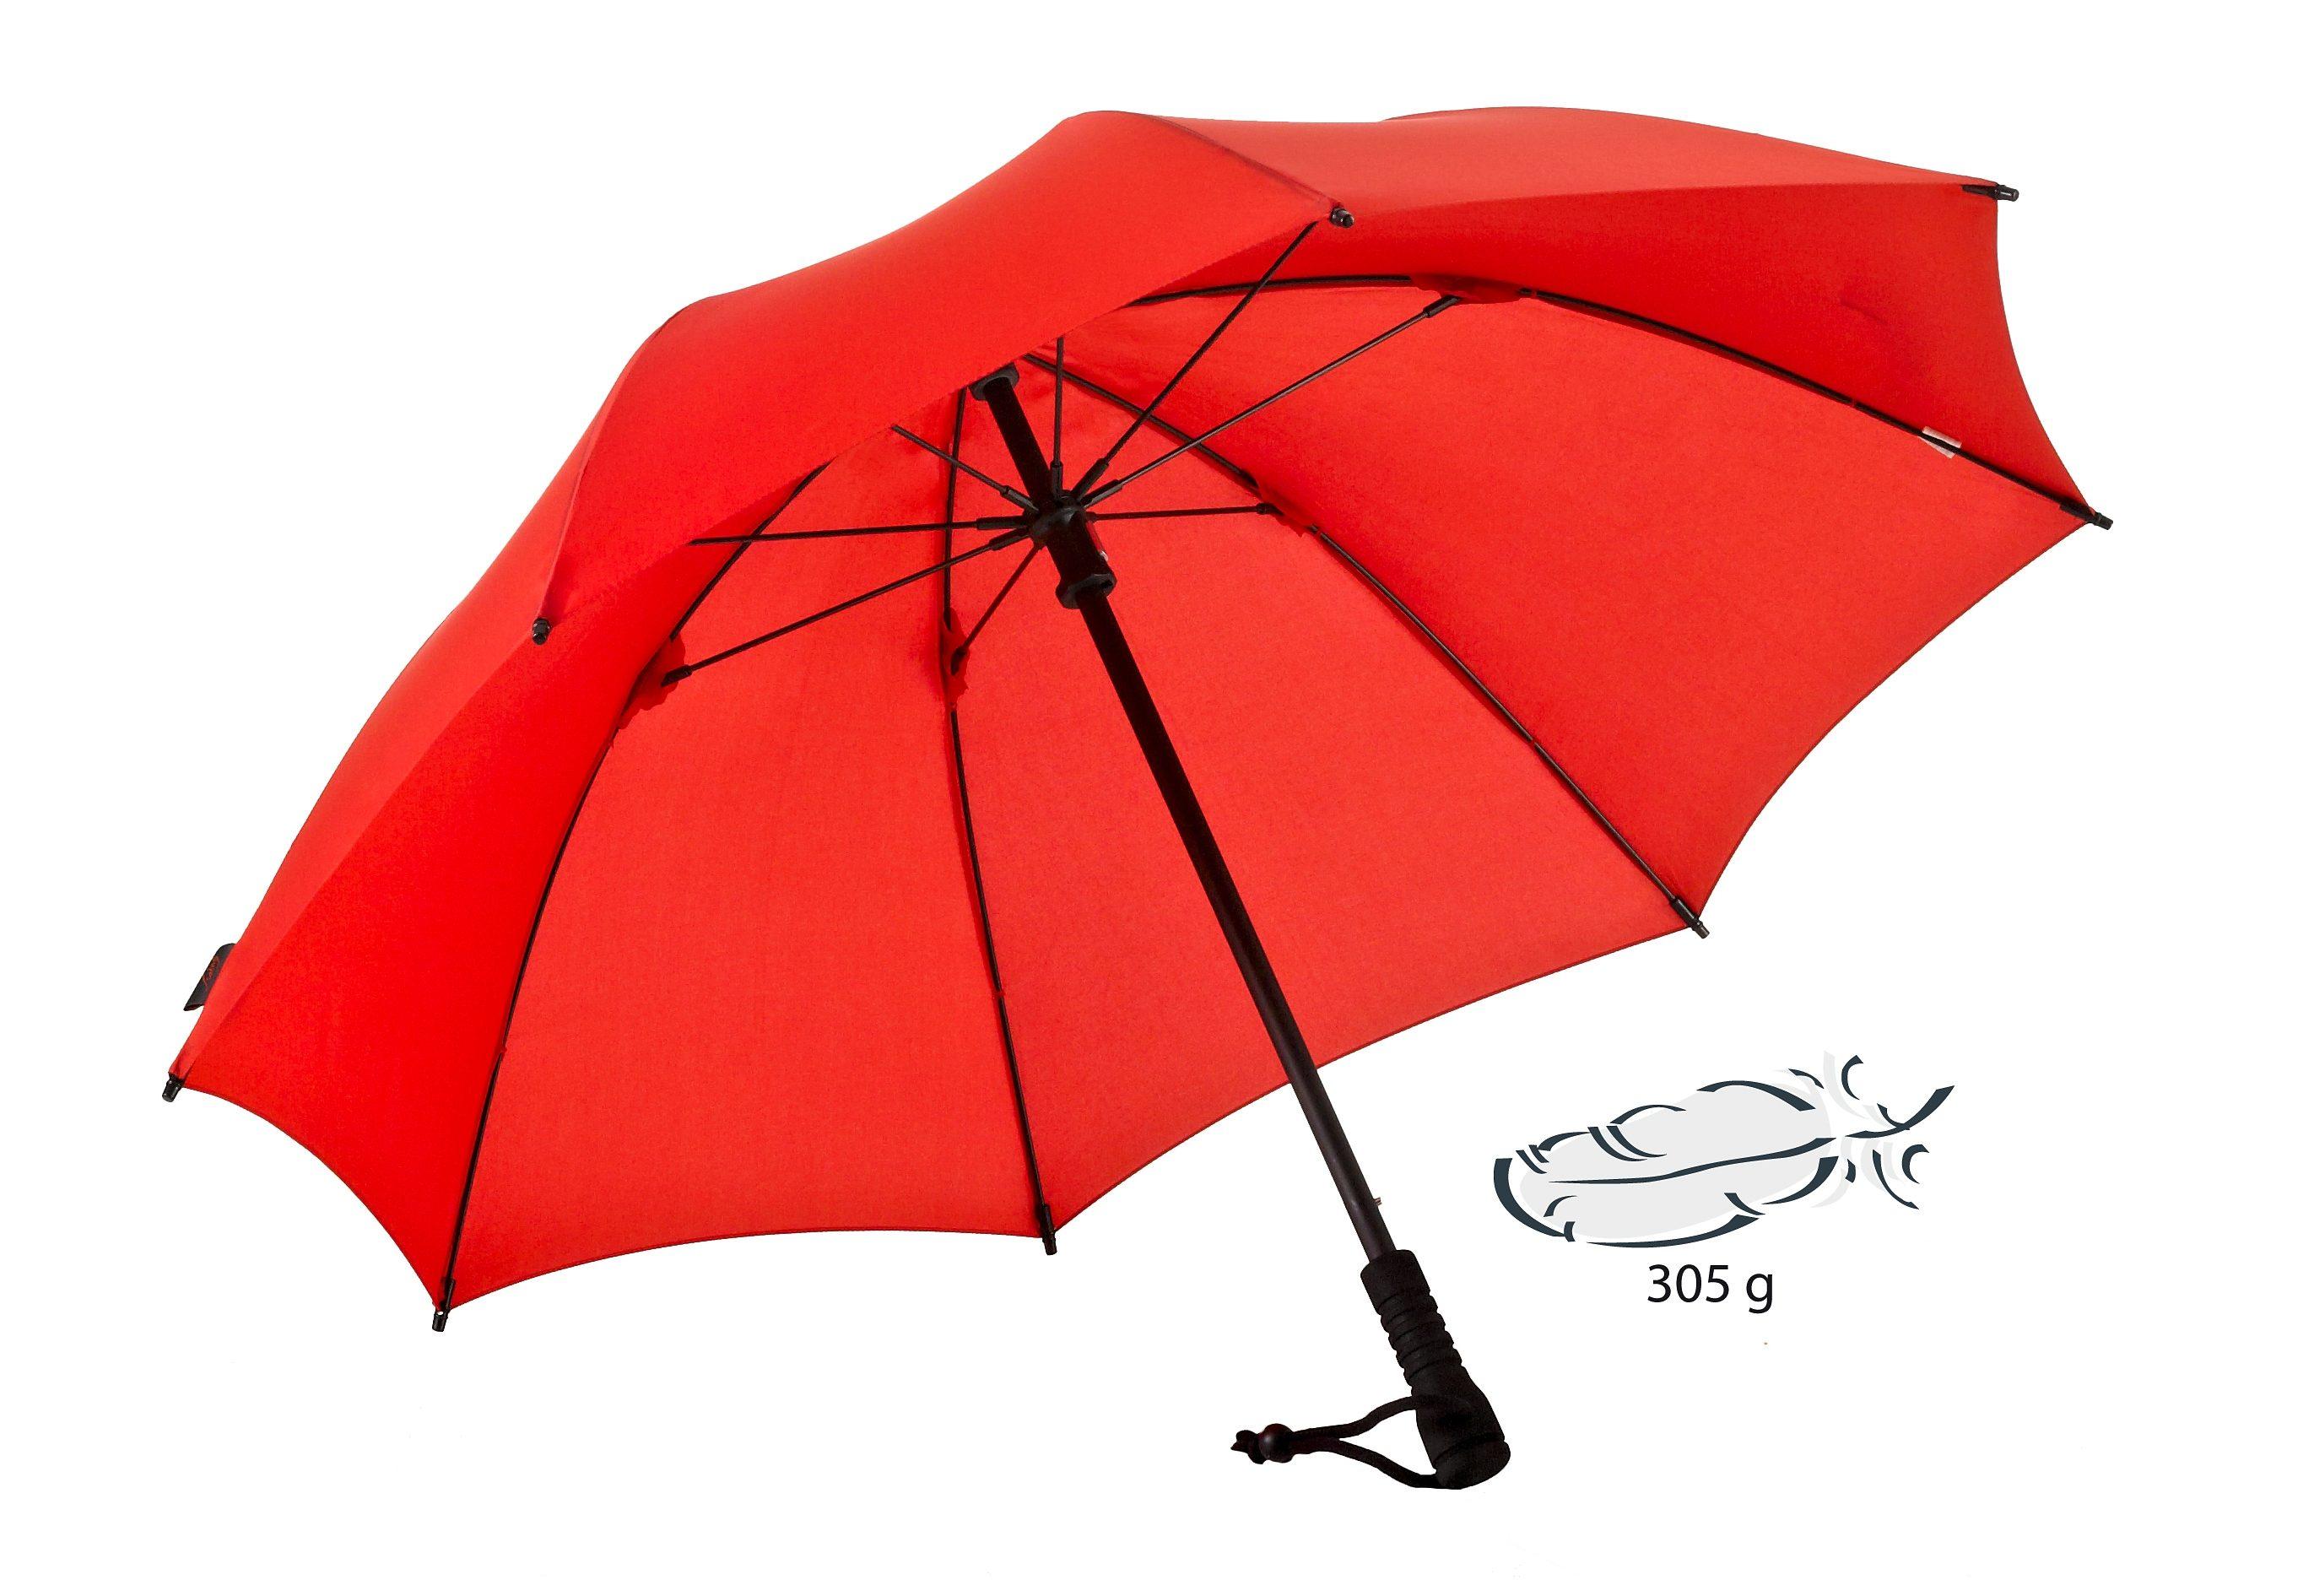 Euroschirm® Regenschirm, »Swing Trekkingschirm«   Accessoires > Regenschirme > Sonstige Regenschirme   Rot   Glasfaser   EUROSCHIRM®